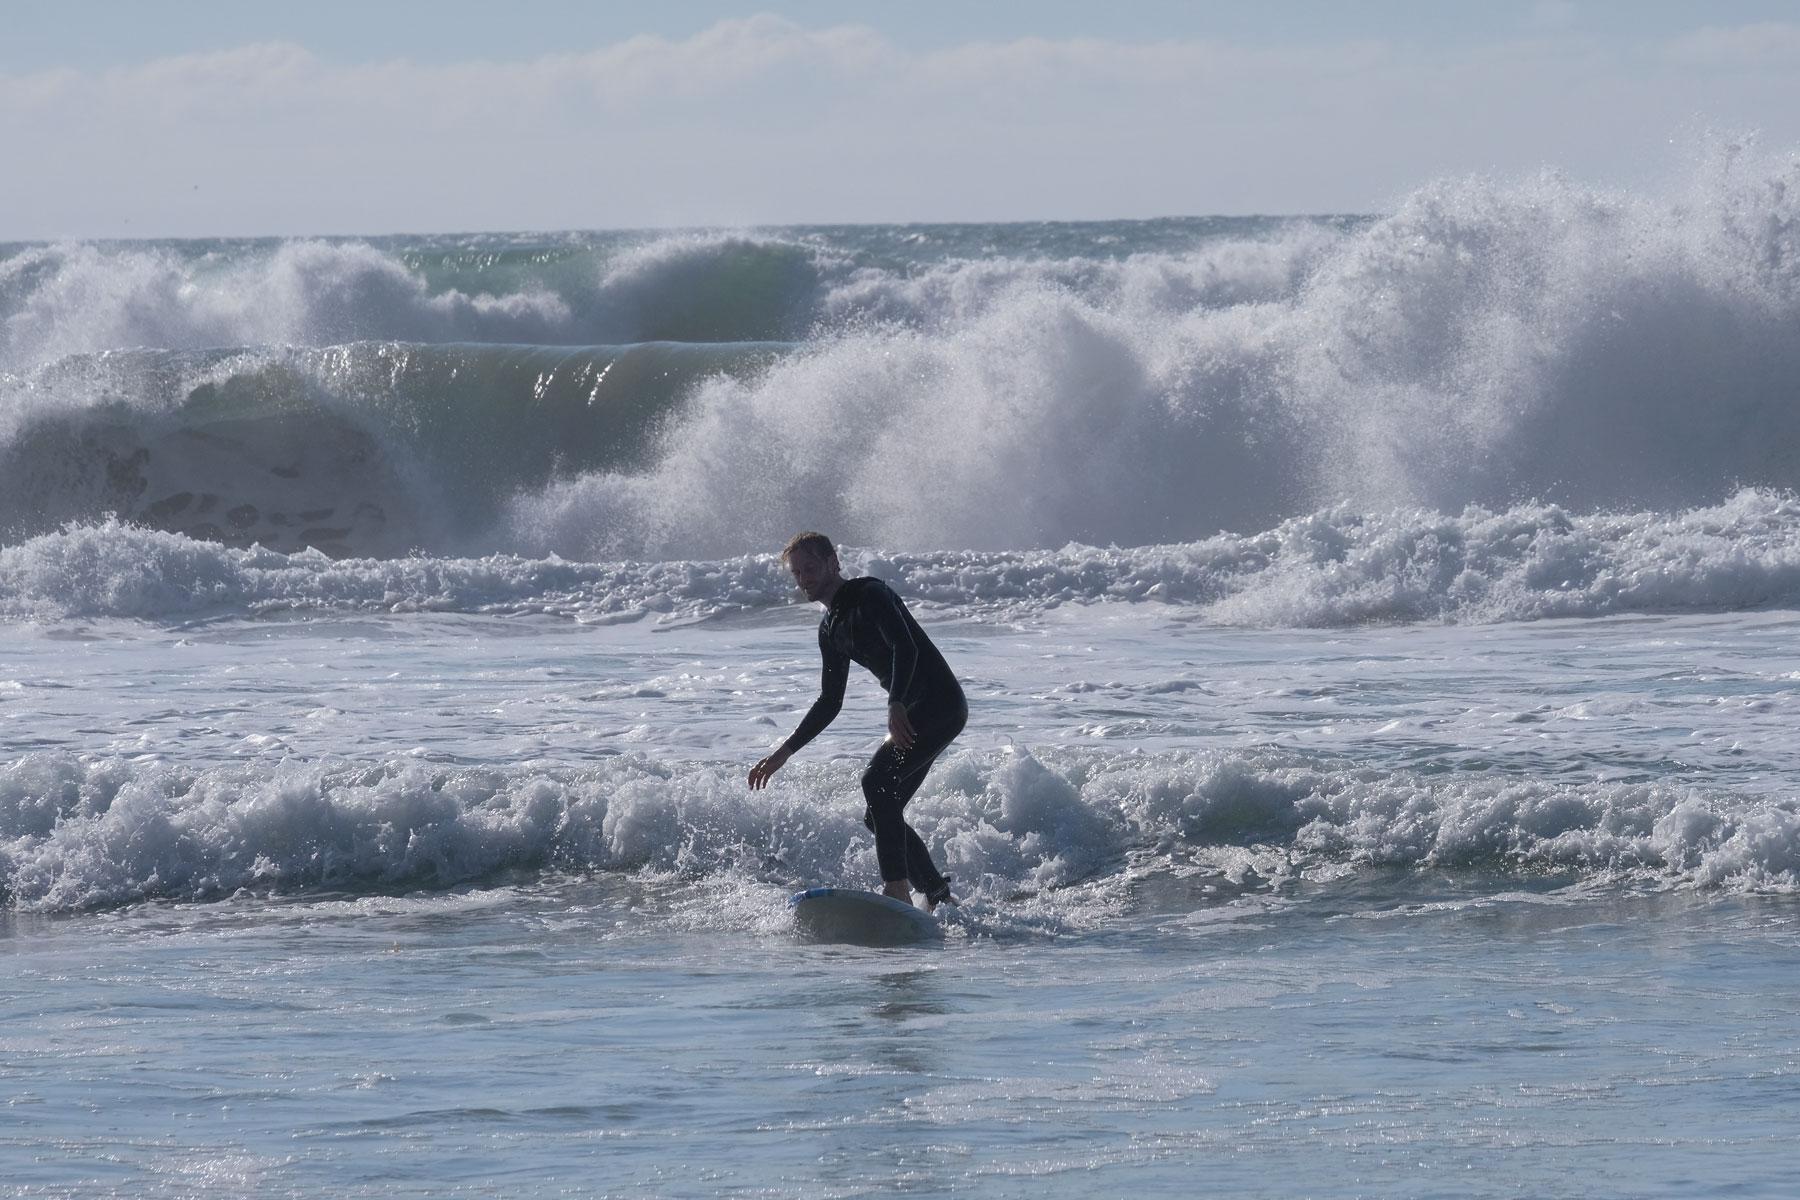 Sebastian surft in den Wellen des Pazifiks